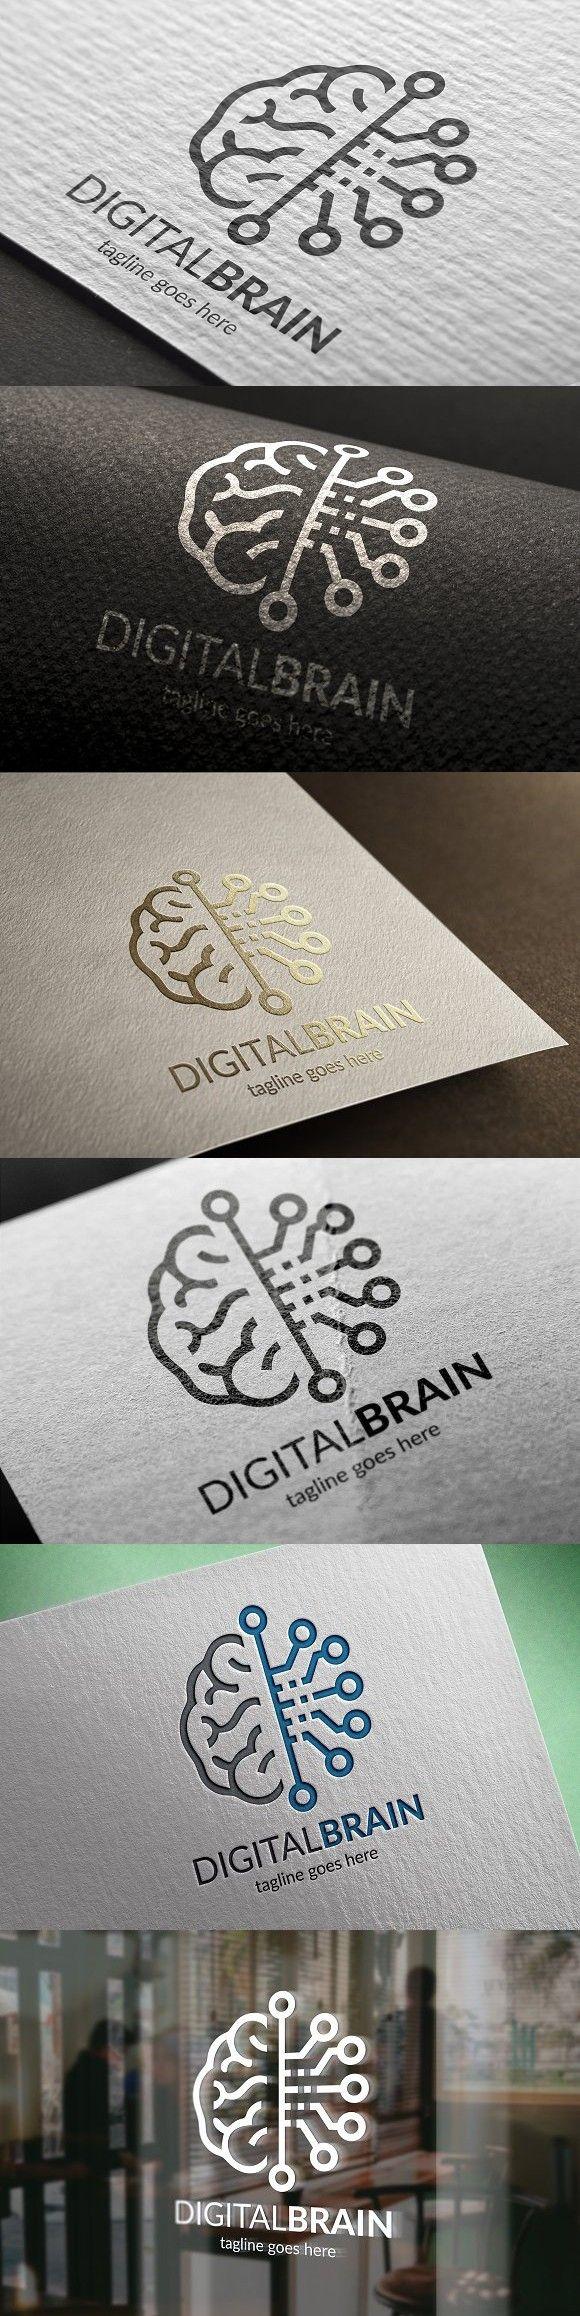 Digital Brain Logo Brain logo, Web graphic design, Human